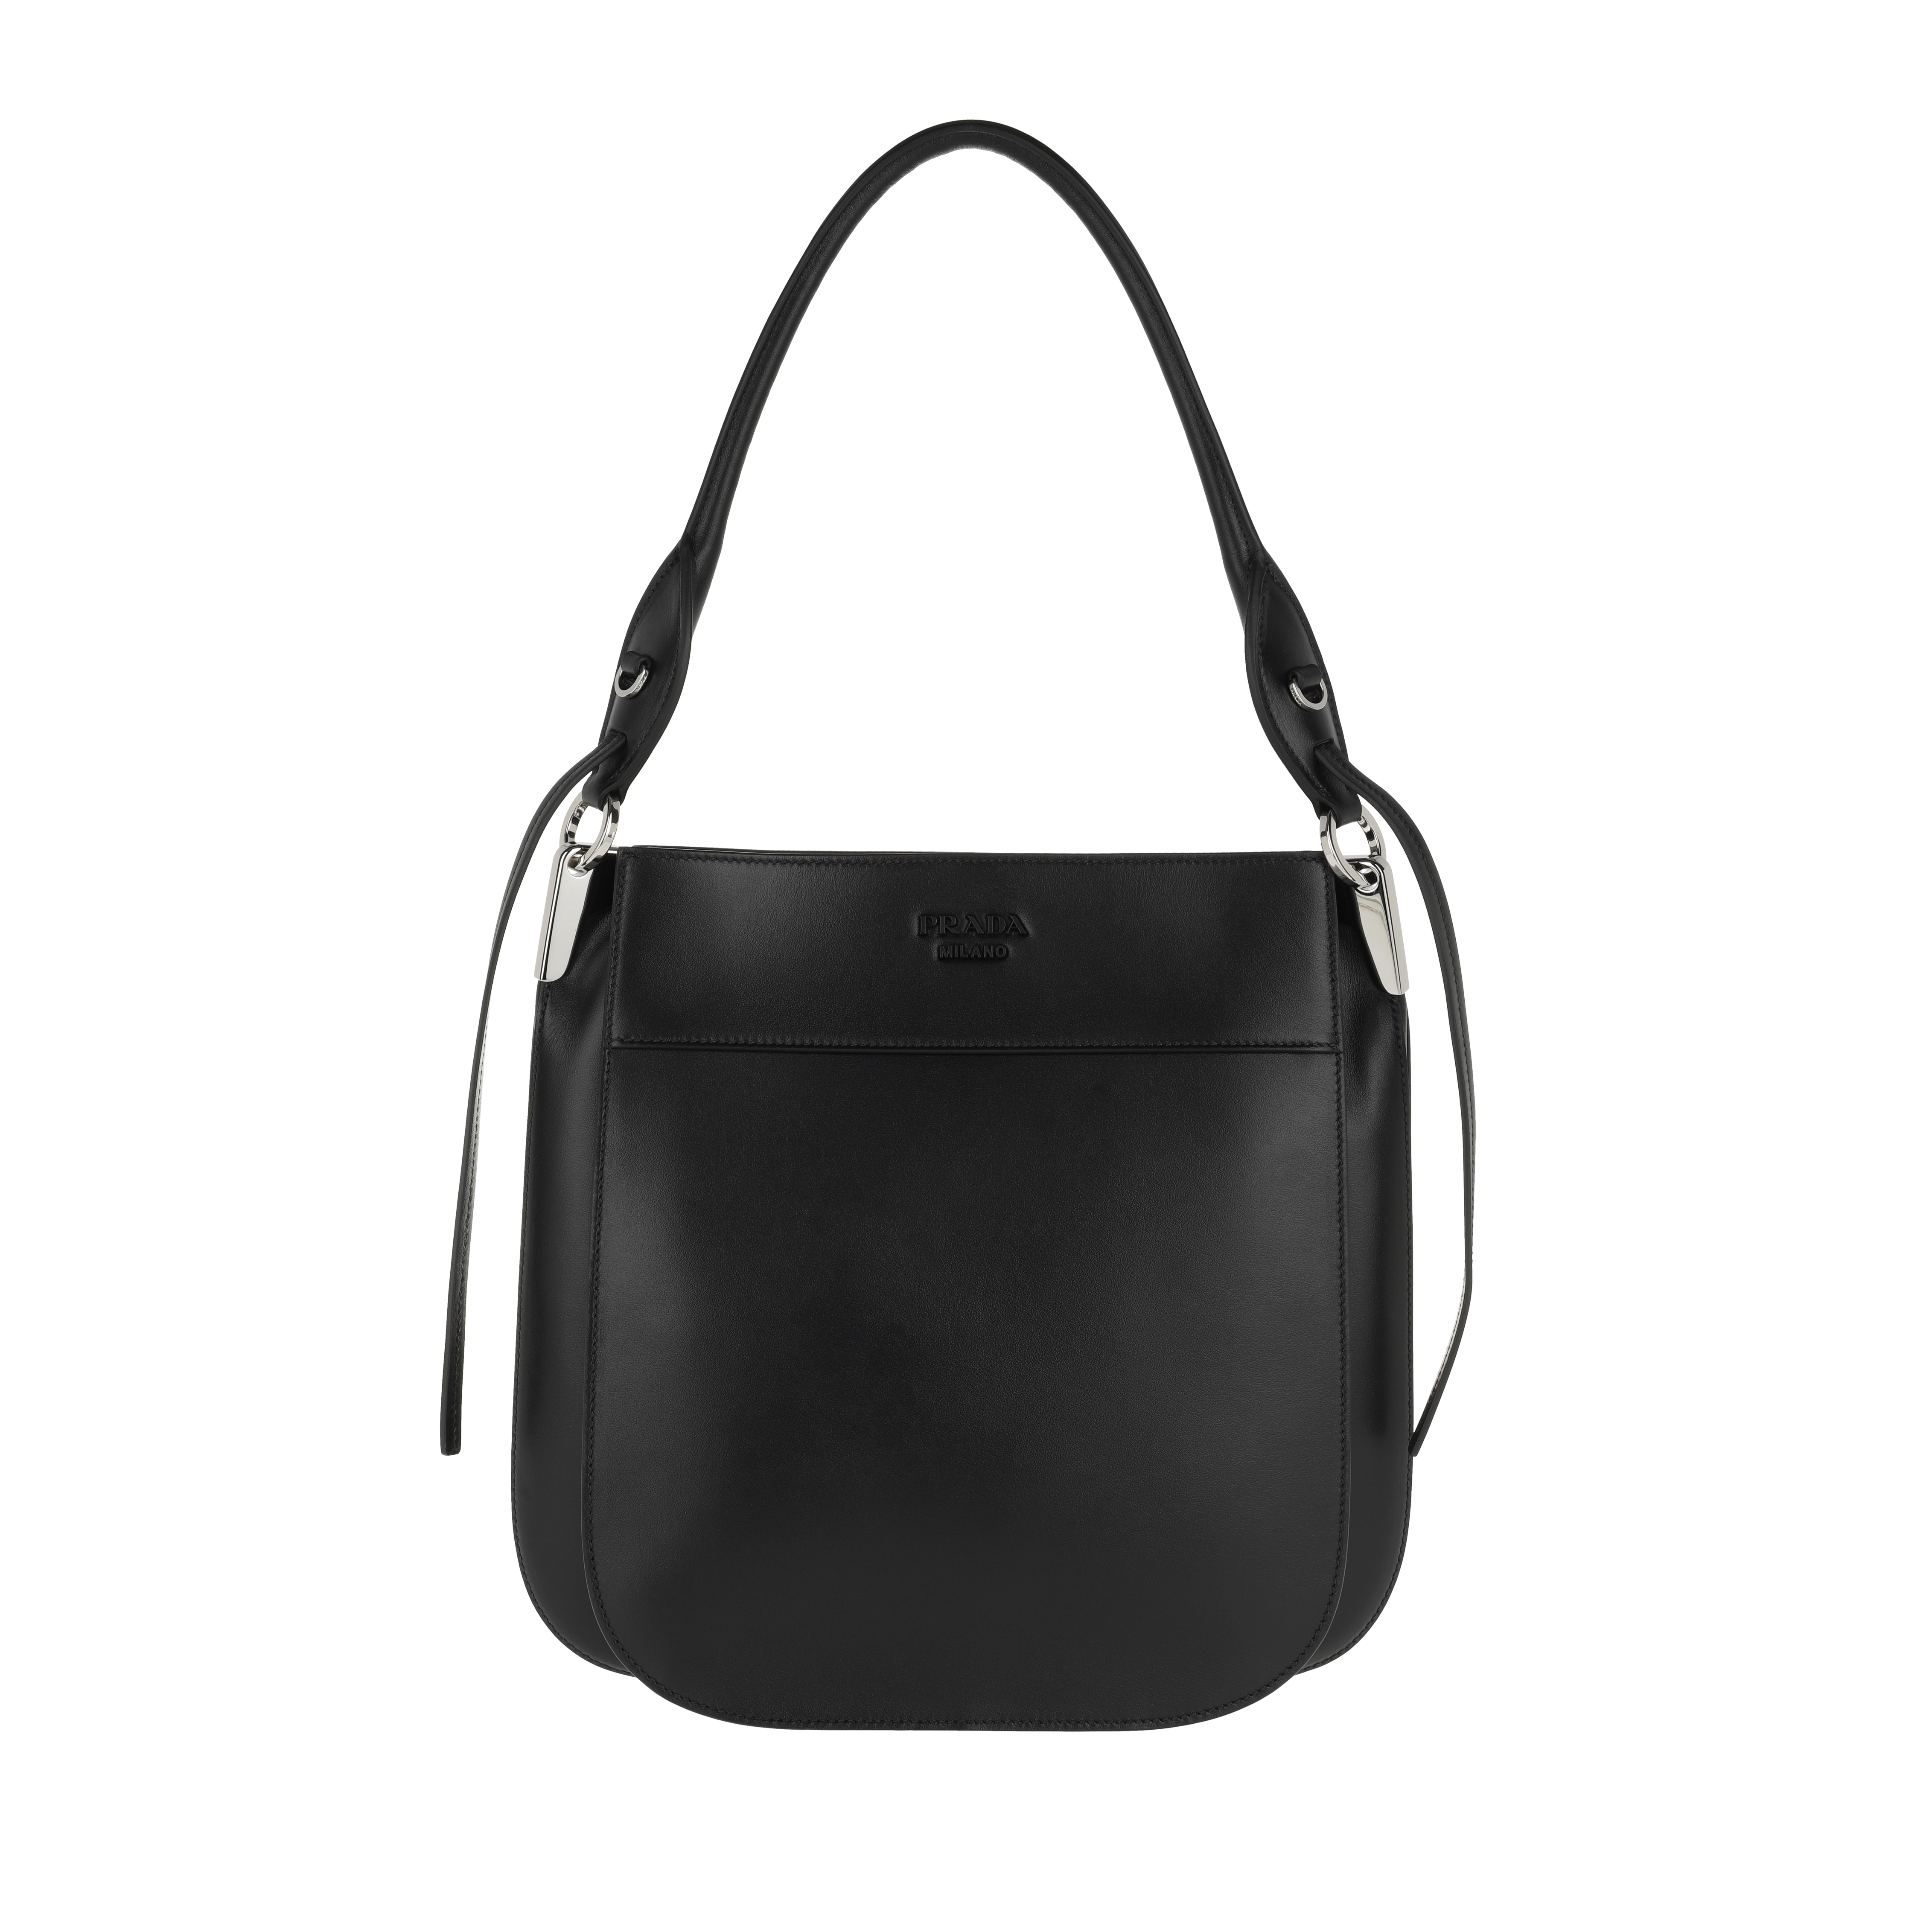 Prada Hobo Bag Margit Leather Shoulder Bag Nero in